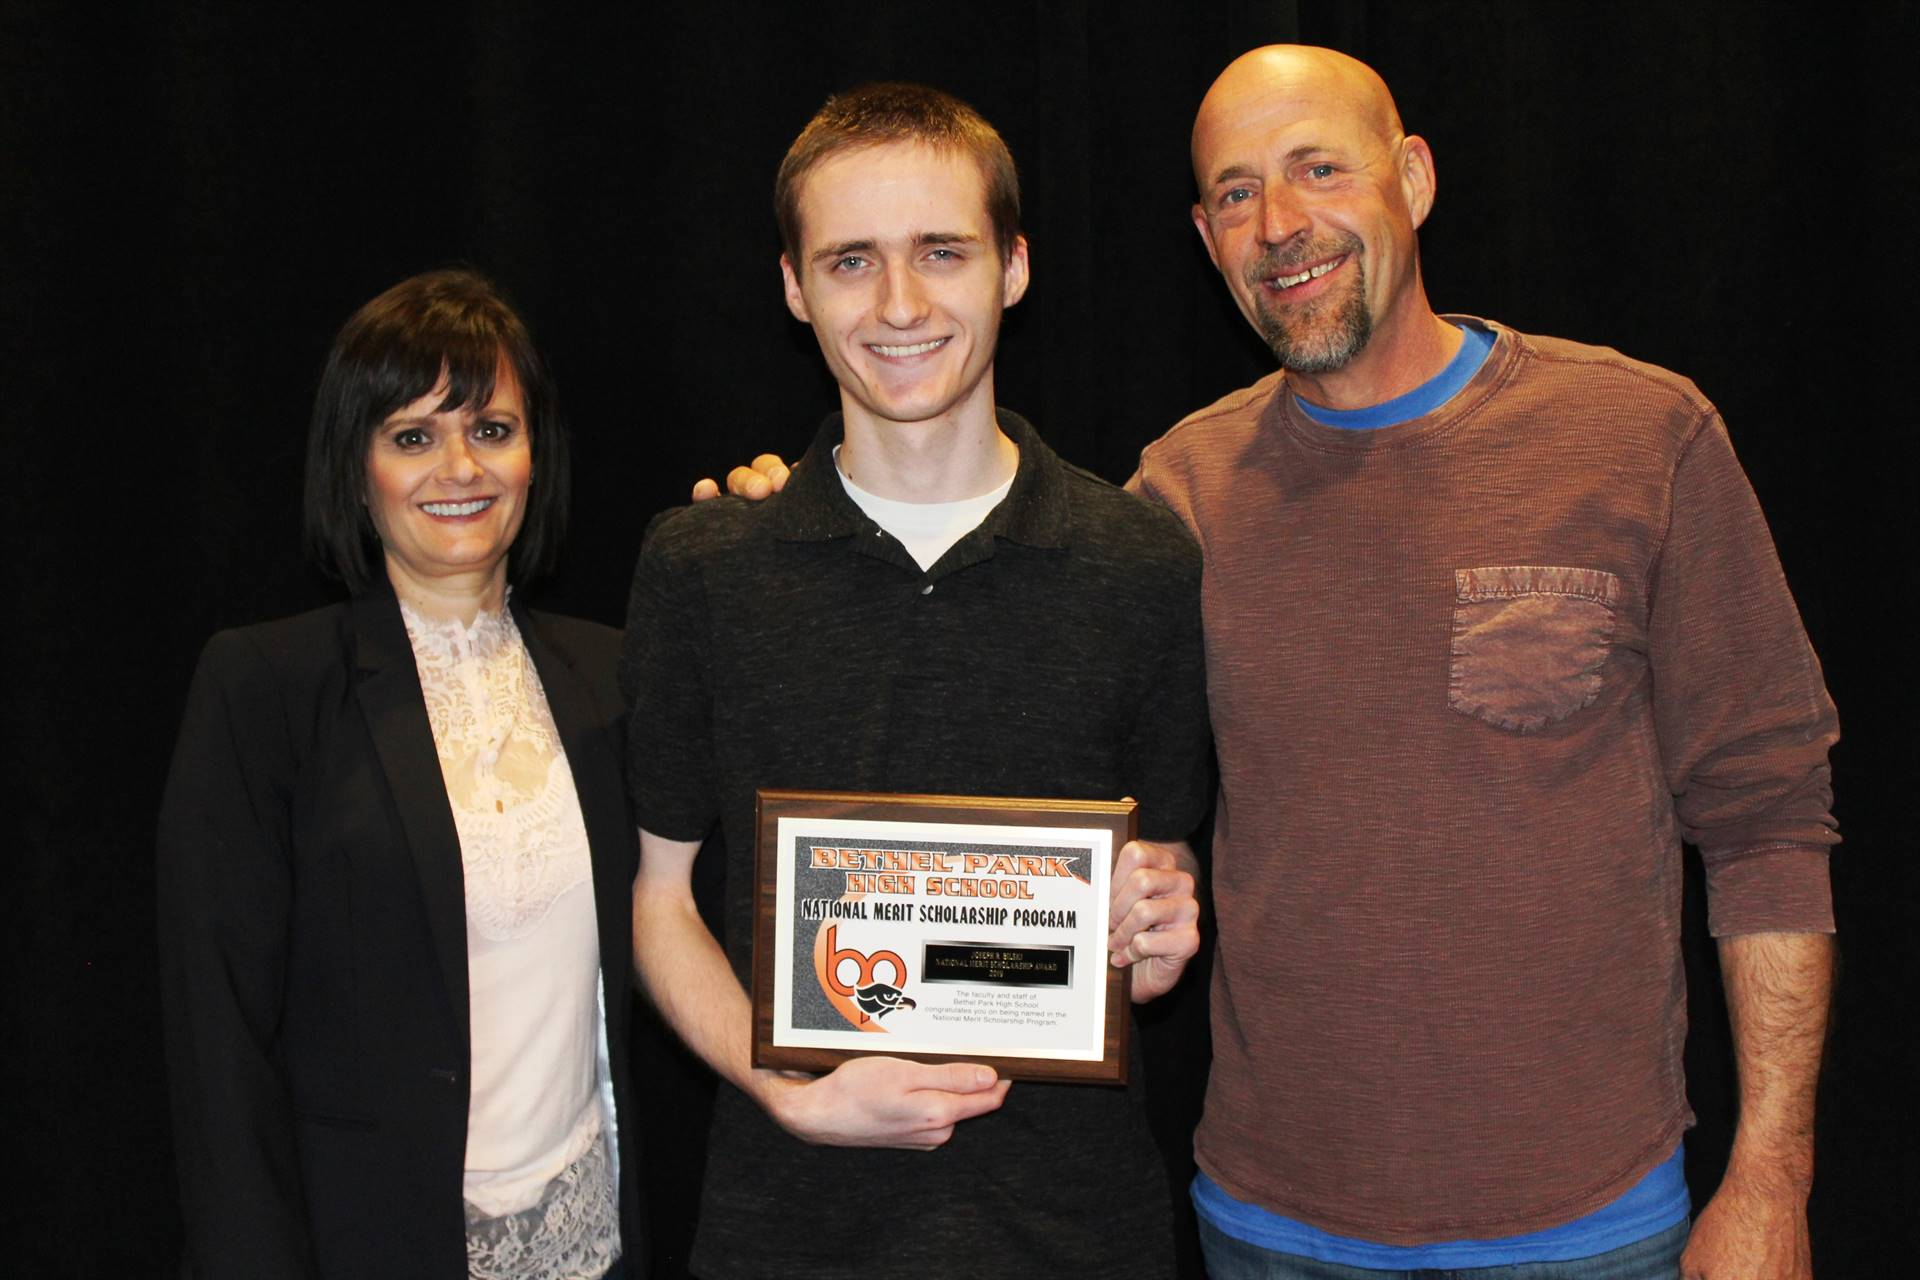 Joseph Bilski and his parents